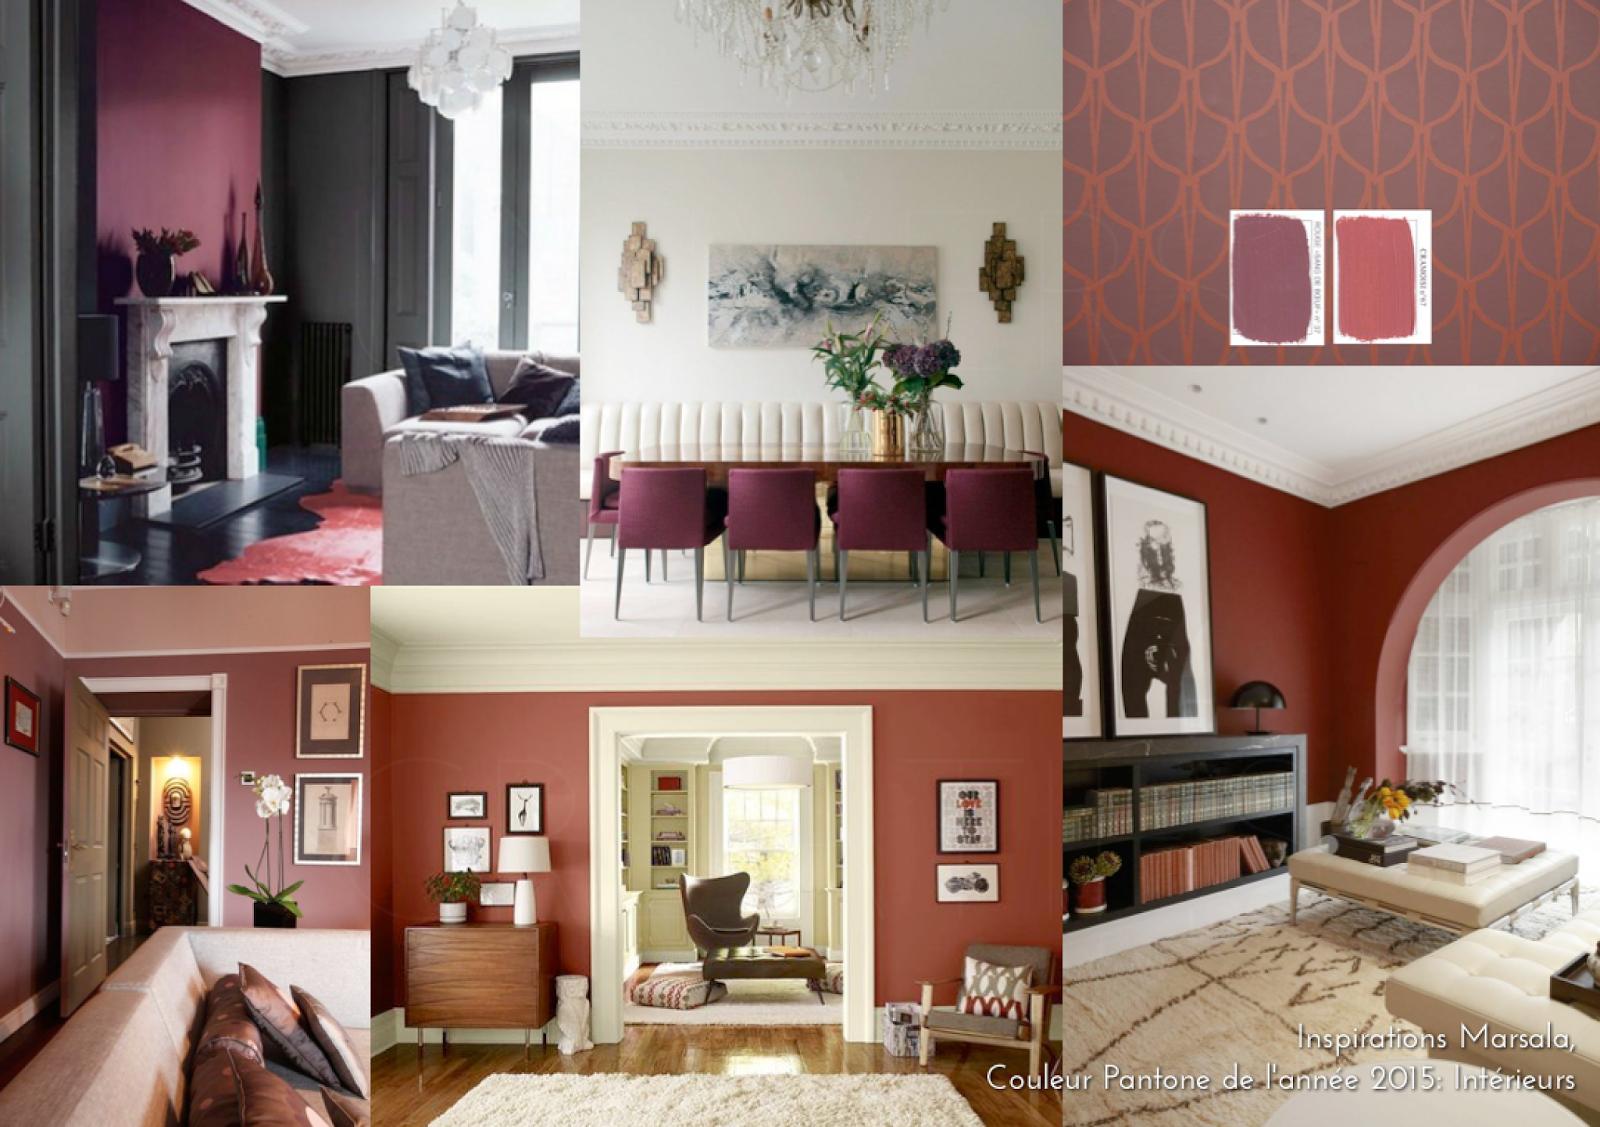 tendance papier peint salle a manger beautiful with tendance papier peint salle a manger dco. Black Bedroom Furniture Sets. Home Design Ideas